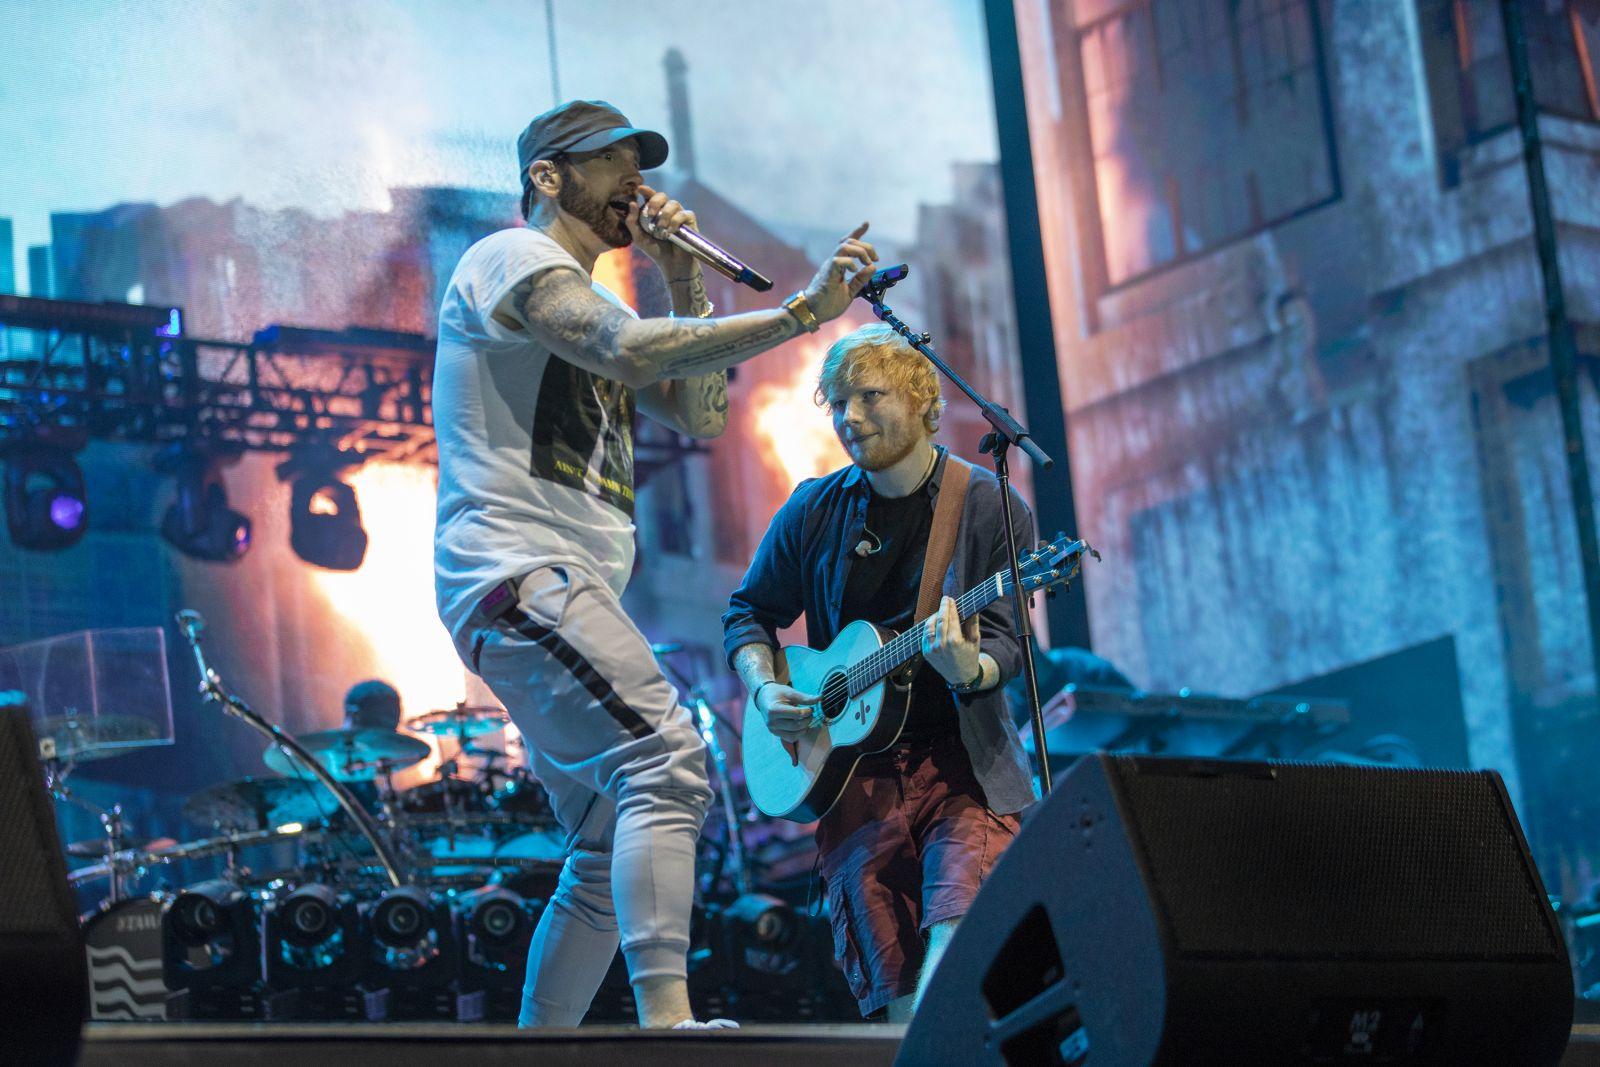 Eminem's 2018 performance at London day 2 UK Revival Tour. Photo Credit: Jeremy Deputat